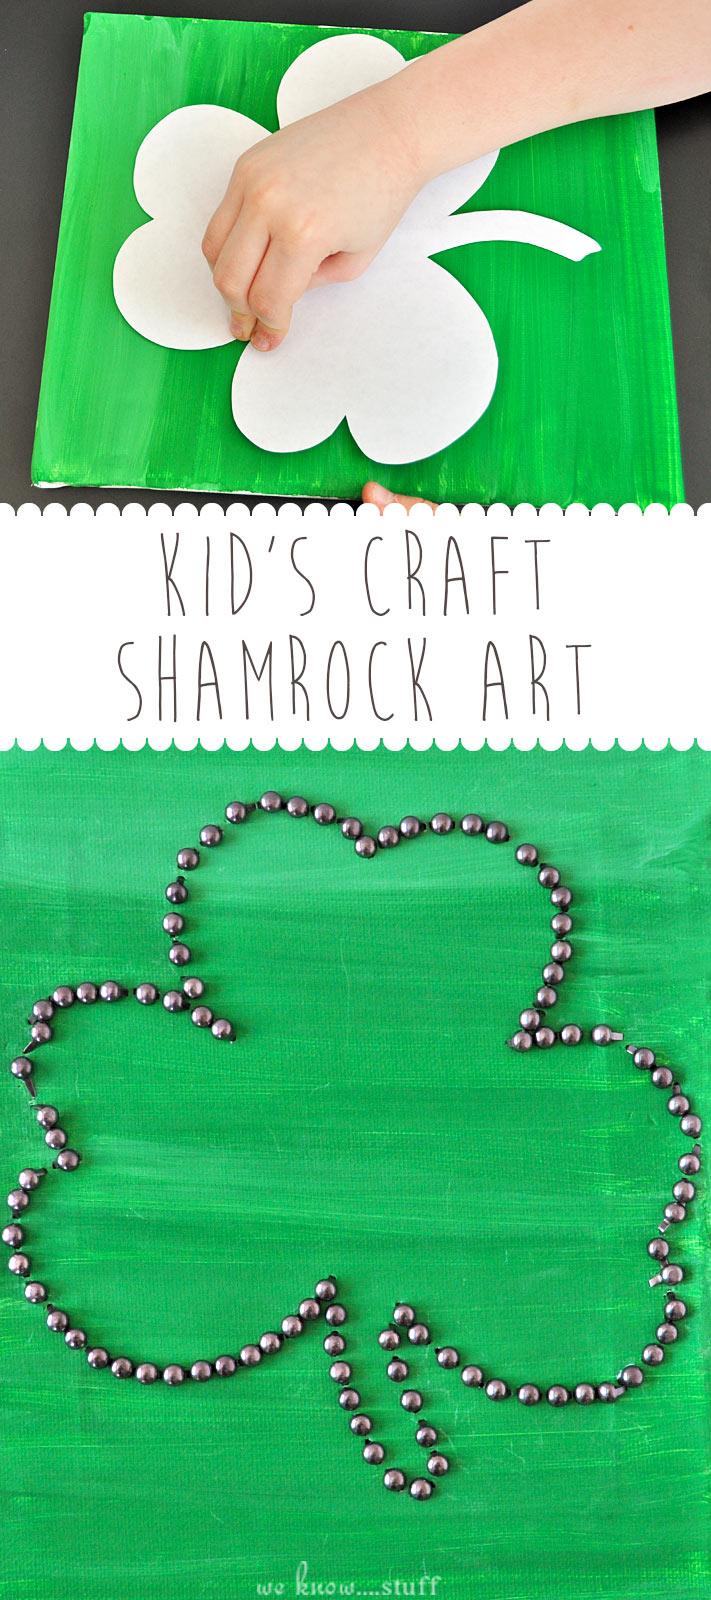 irish crafts for kids shamrock canvas art we know stuff